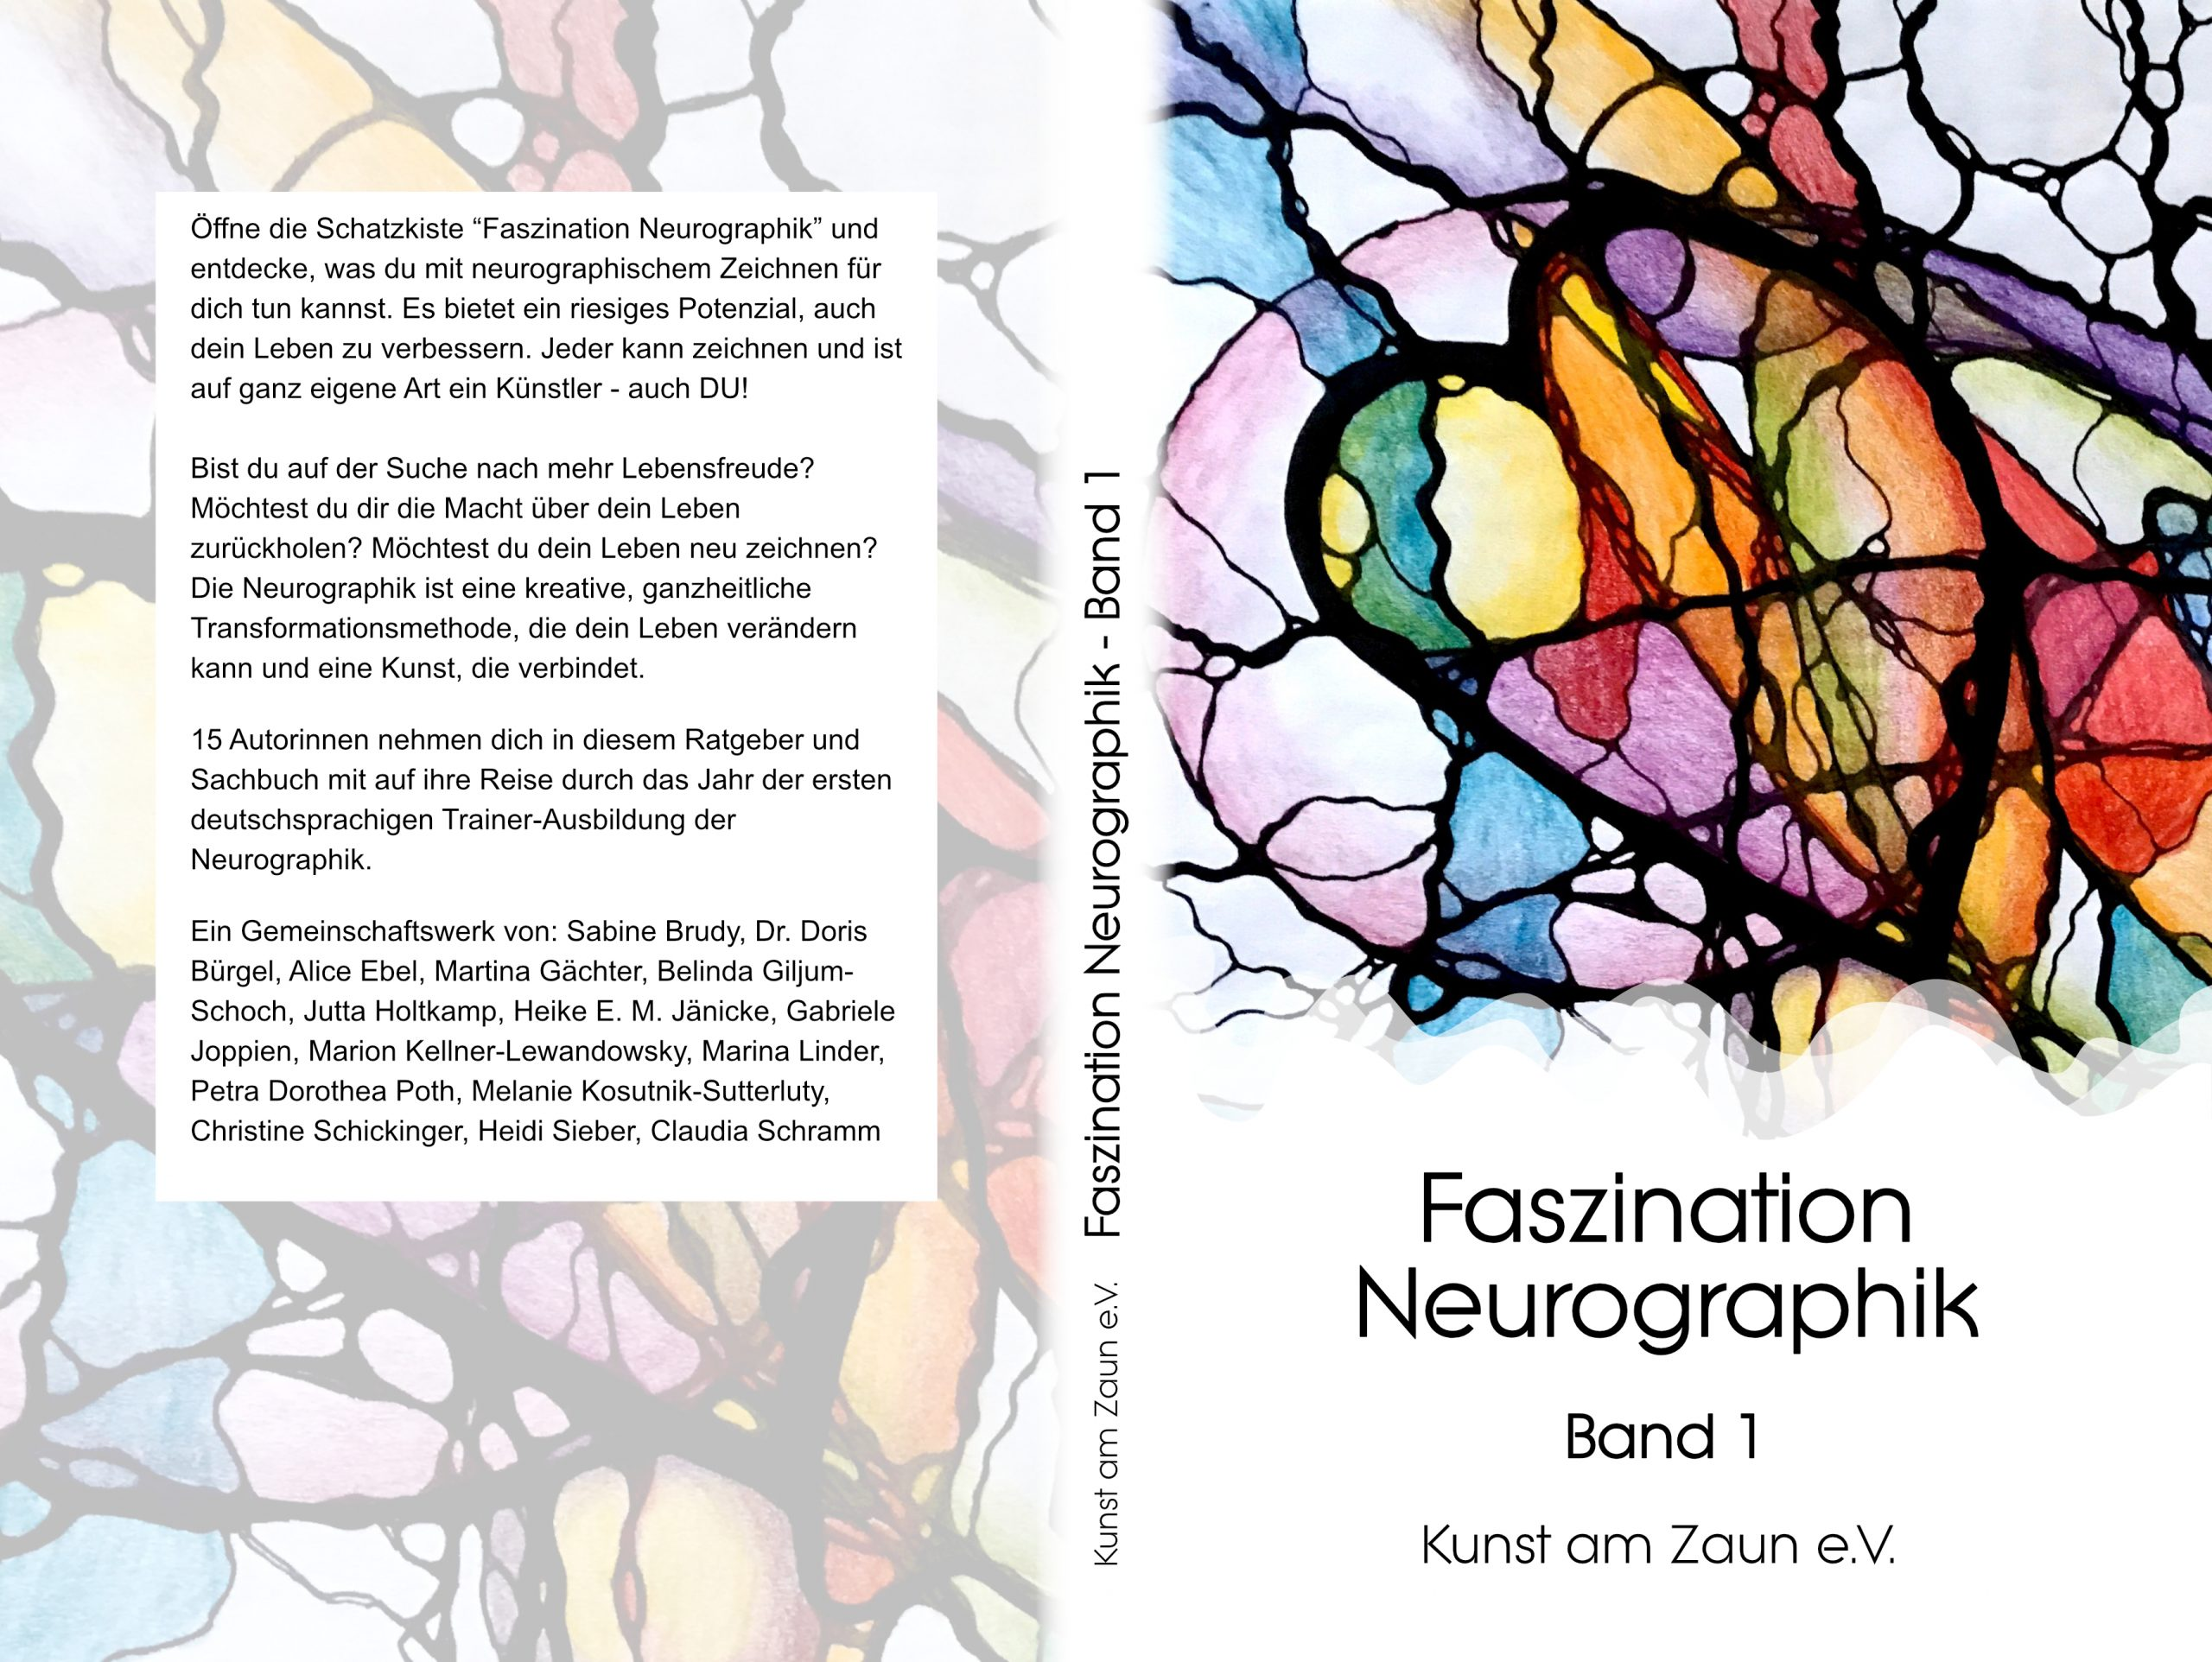 Faszination Neurographik